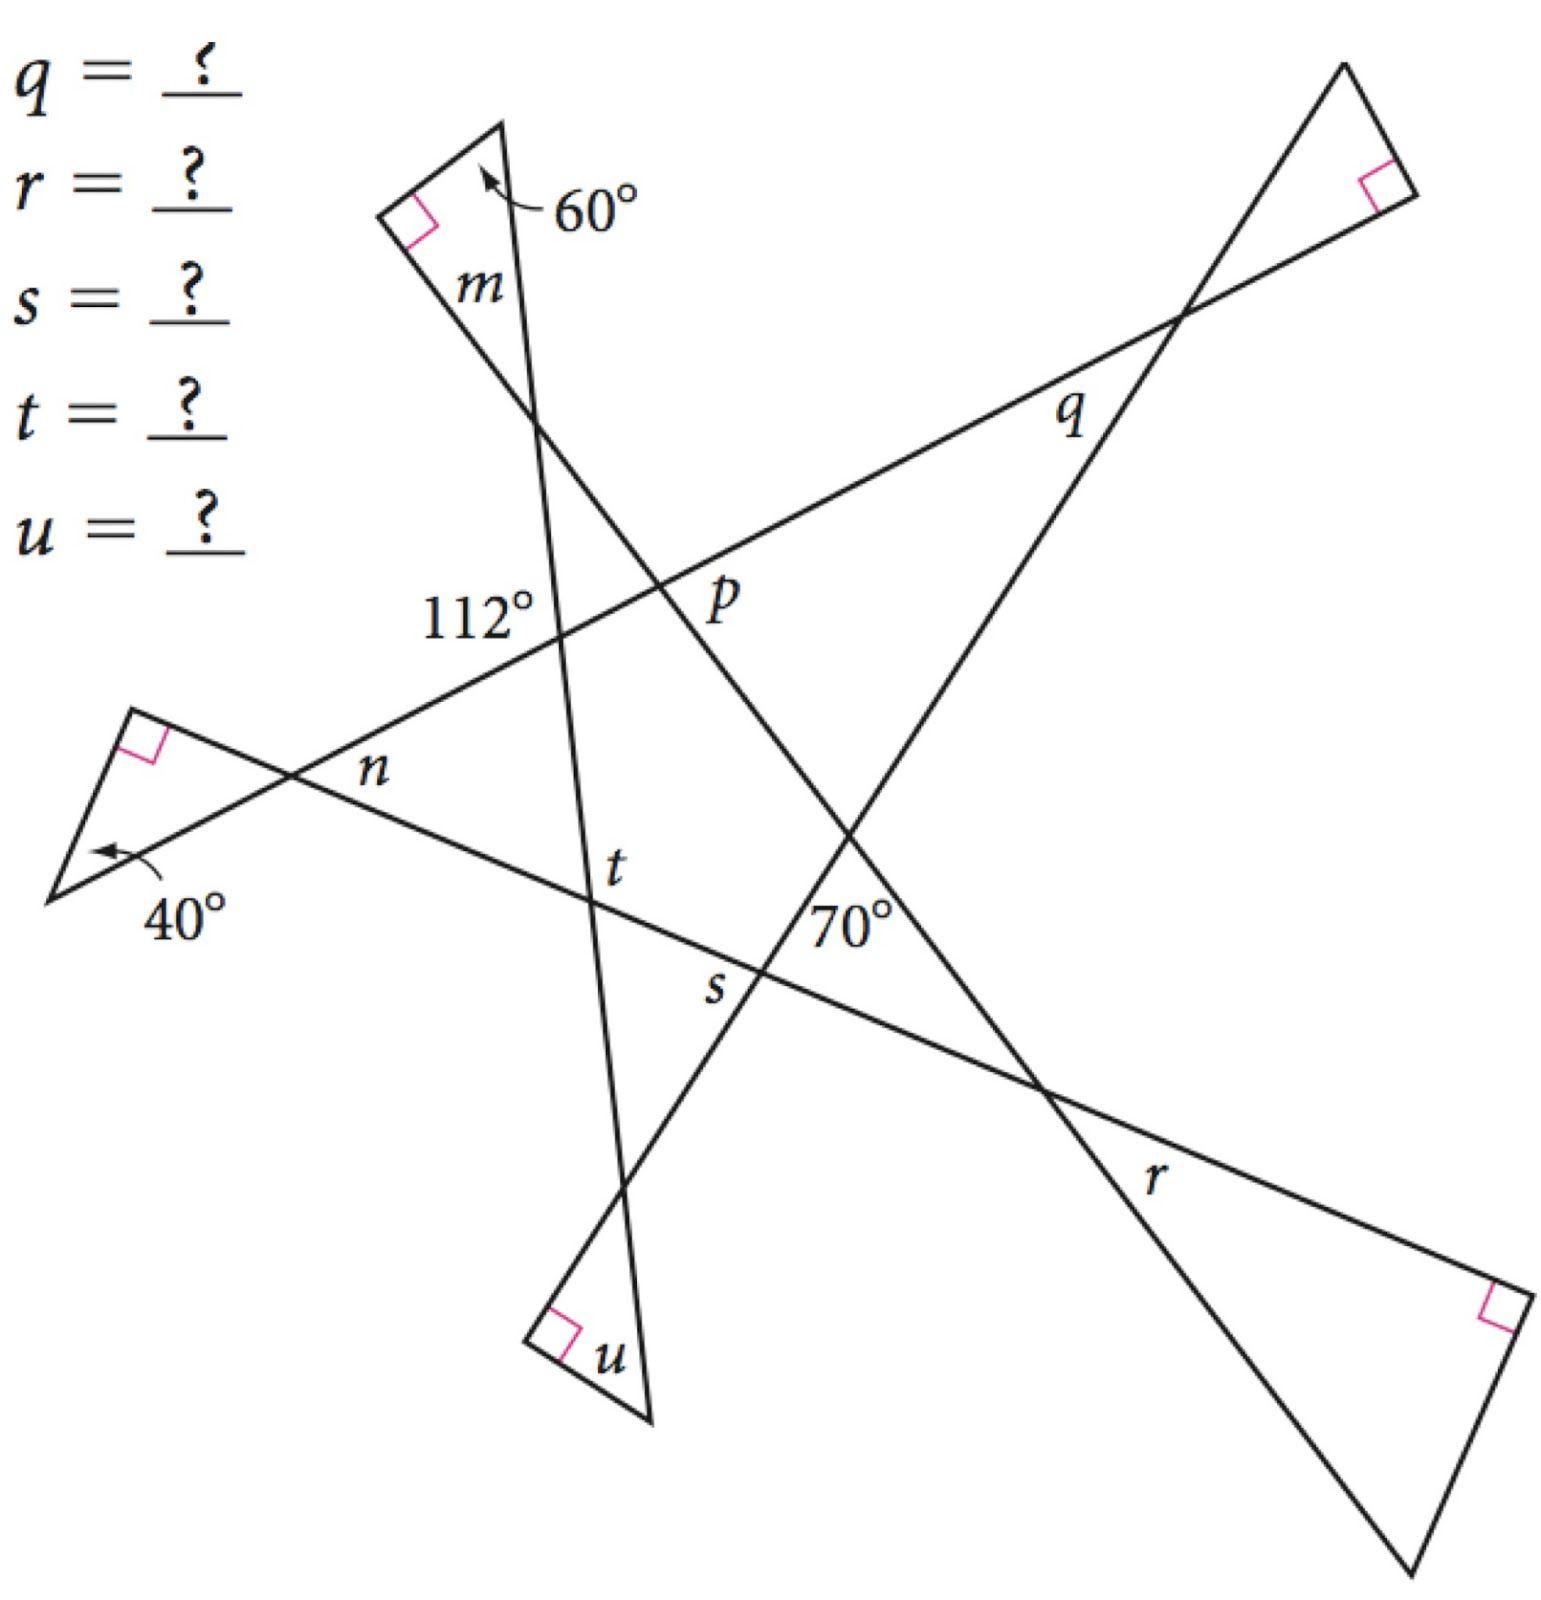 Missing+Angle+Problem+3.jpg (1541×1600) | Math | Pinterest